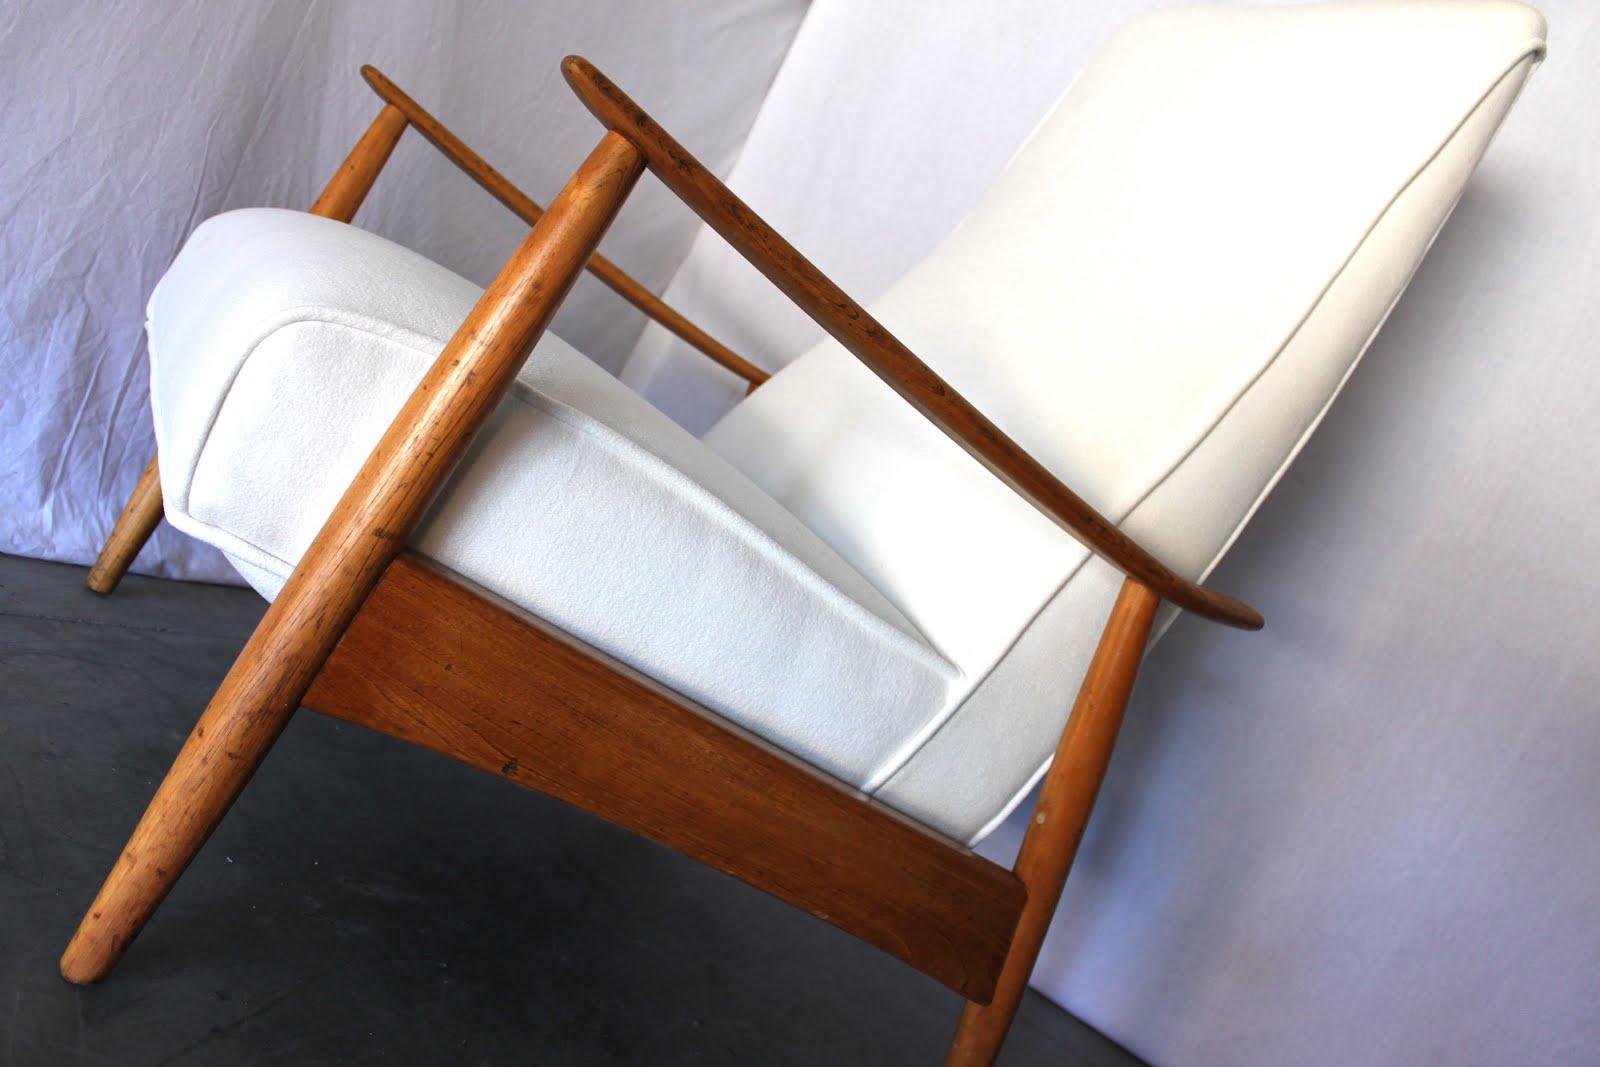 modernhaus shop updates milo baughman recliner moroccan. Black Bedroom Furniture Sets. Home Design Ideas